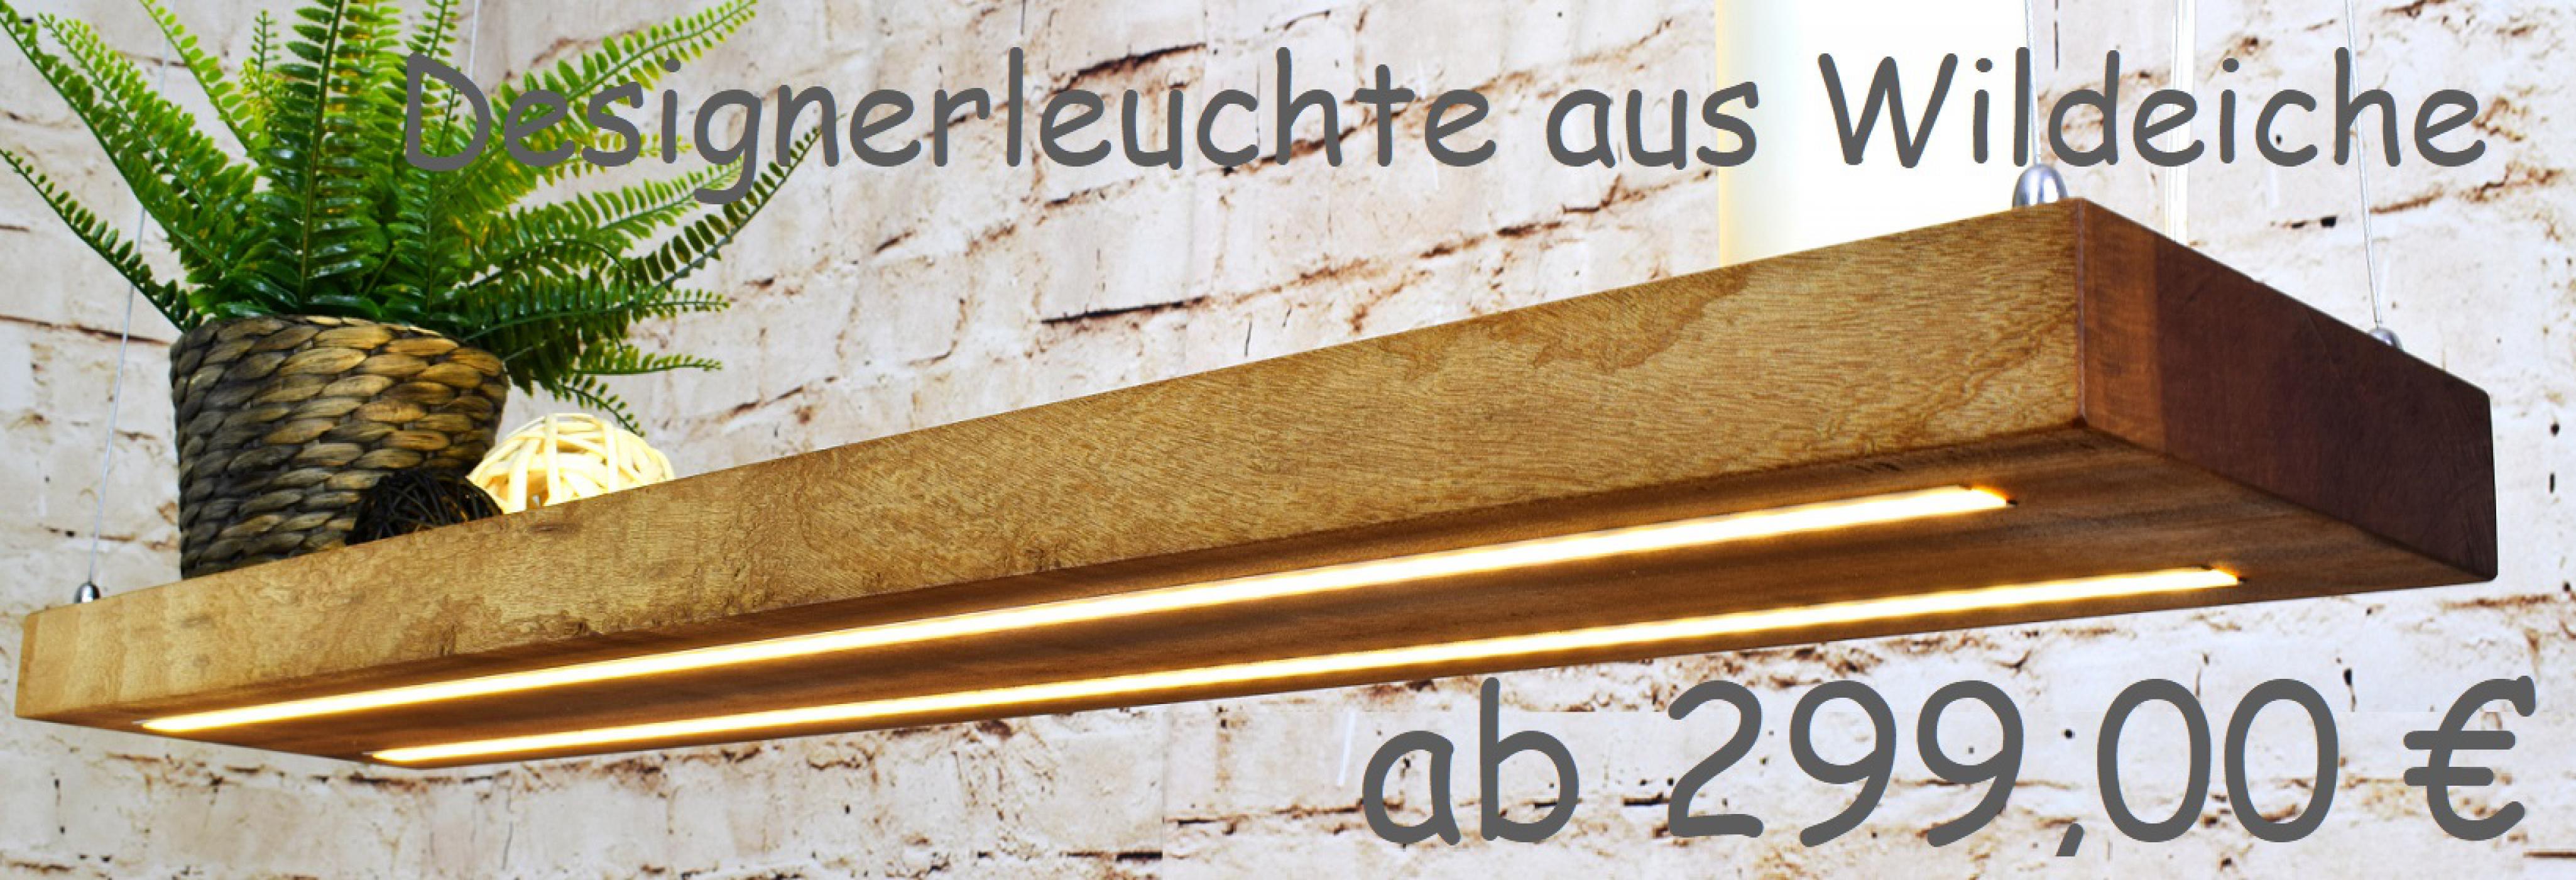 Design, Leuchte, Lampe, Regal, Holz, Wildeiche, Interieur